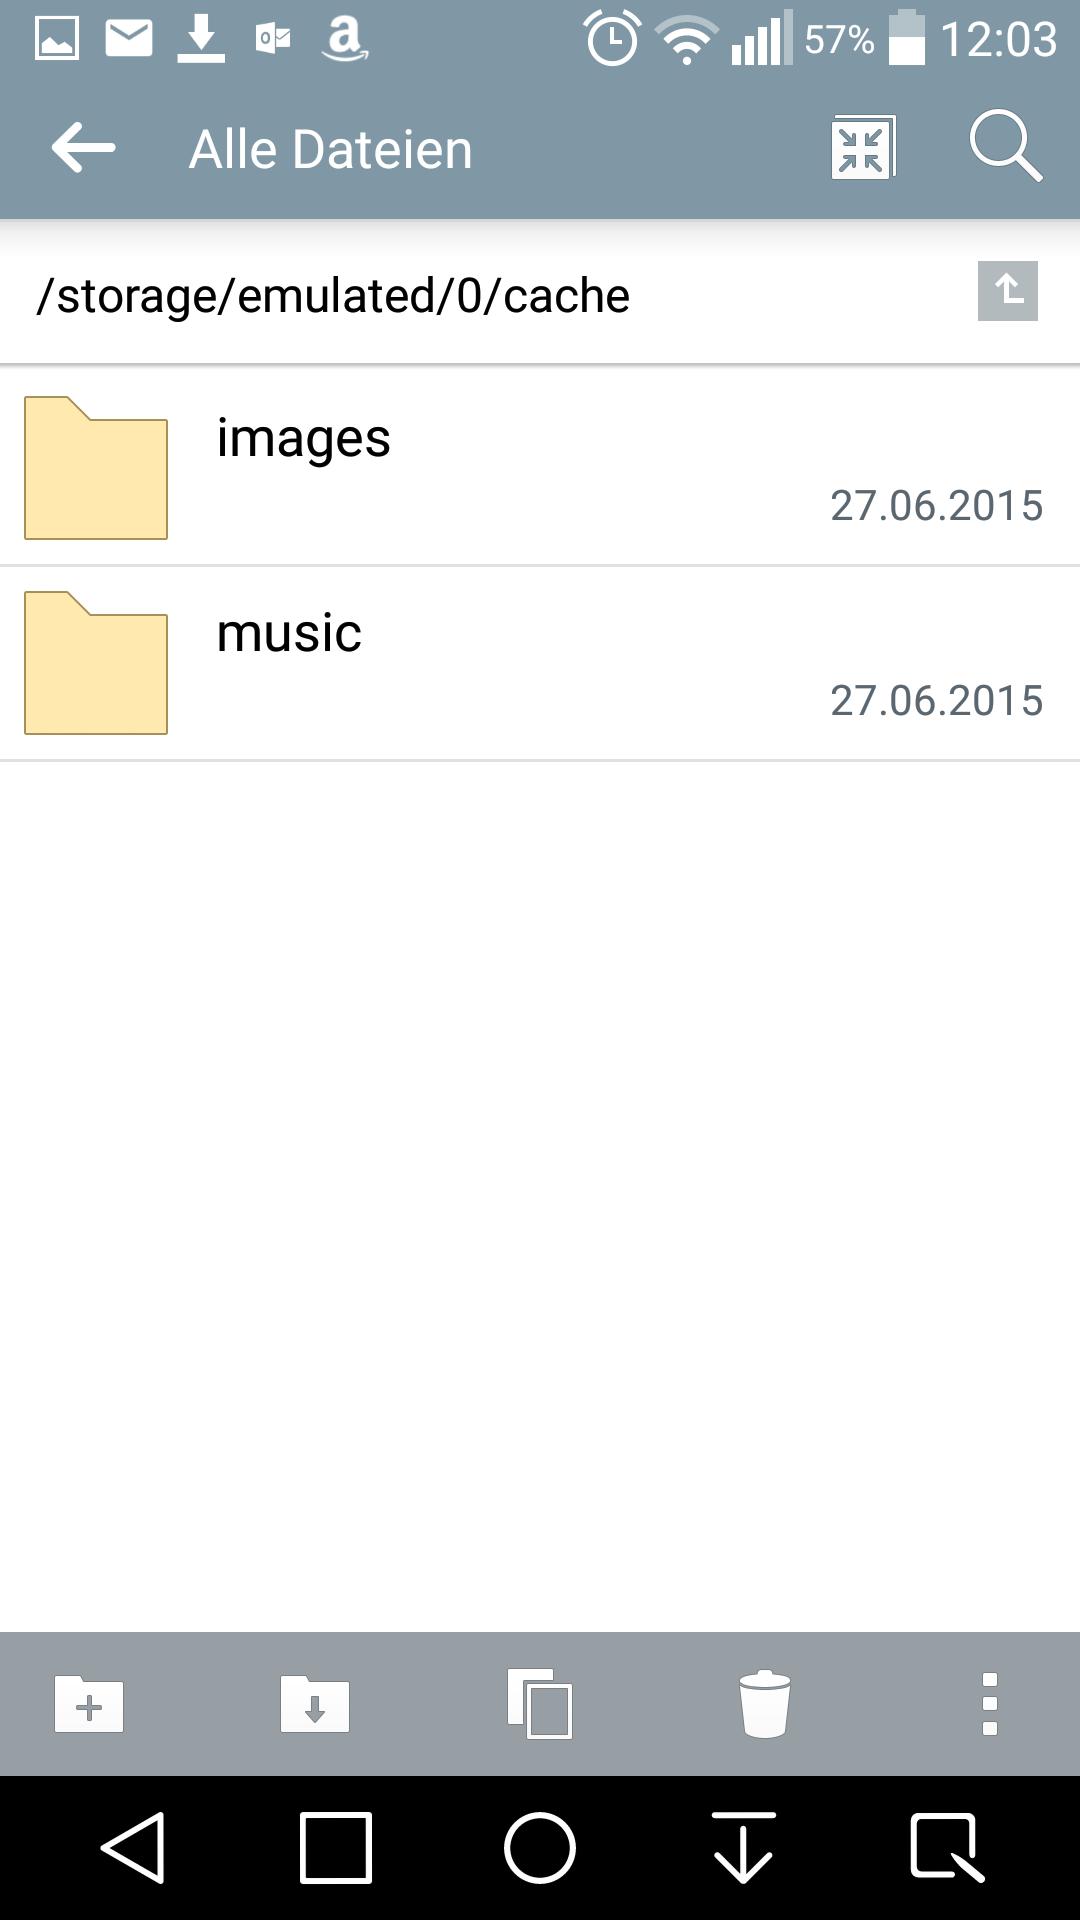 Screenshot_2015-07-02-12-03-20.png